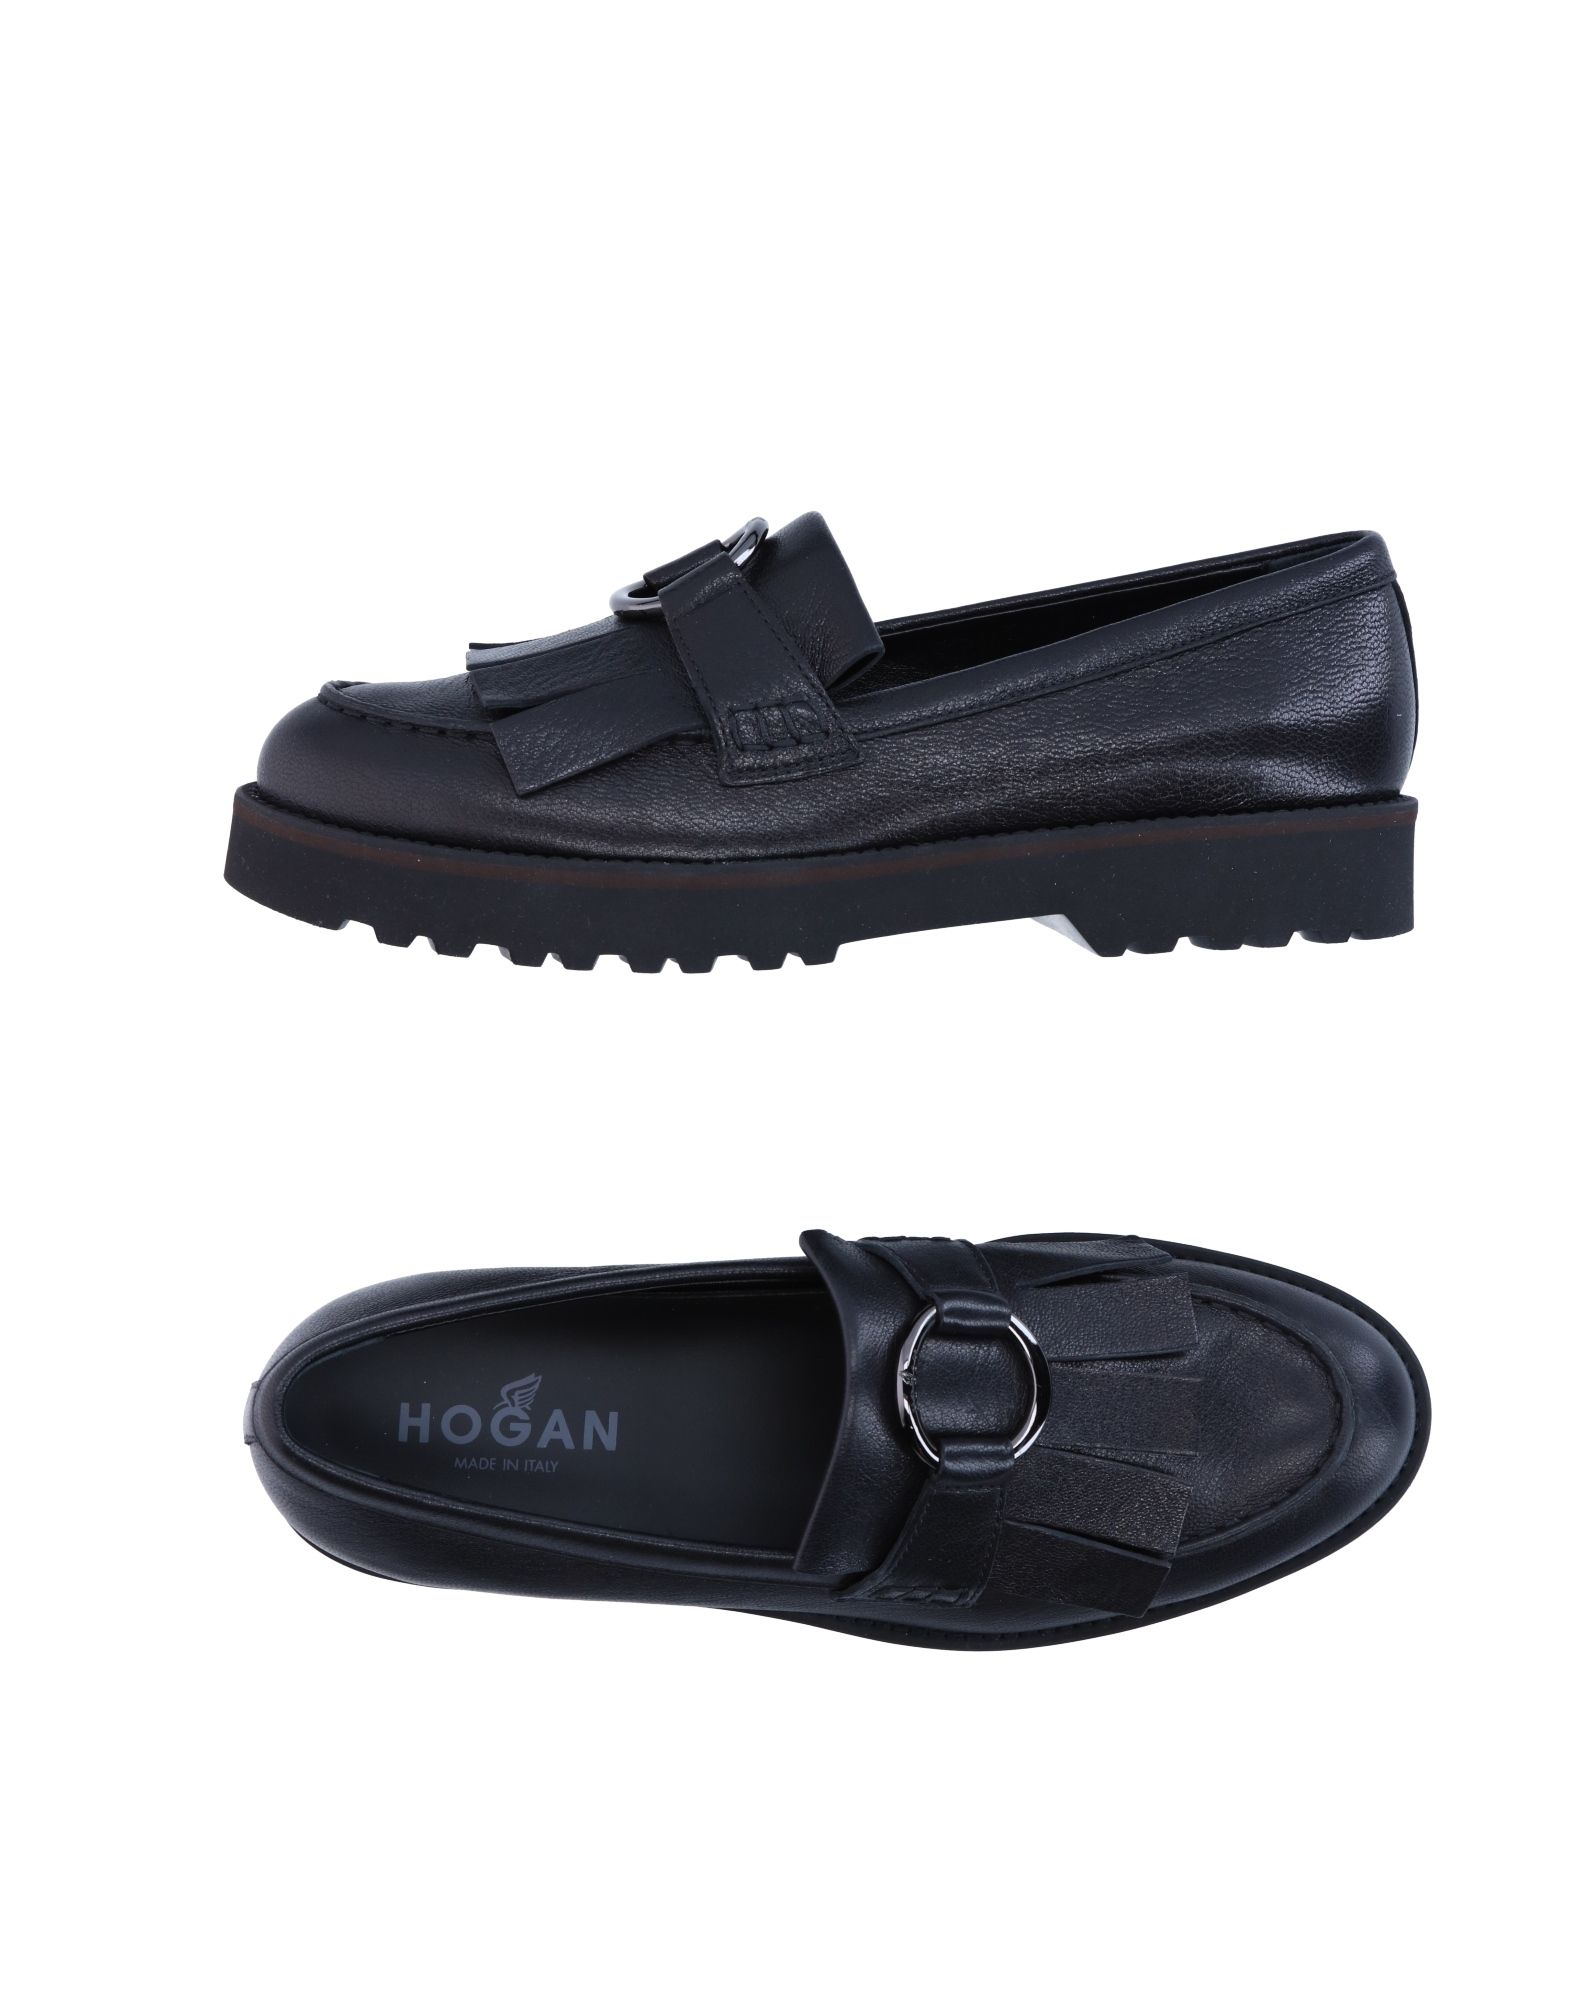 Hogan Loafers - on Women Hogan Loafers online on -  Canada - 11274822GV 45da67